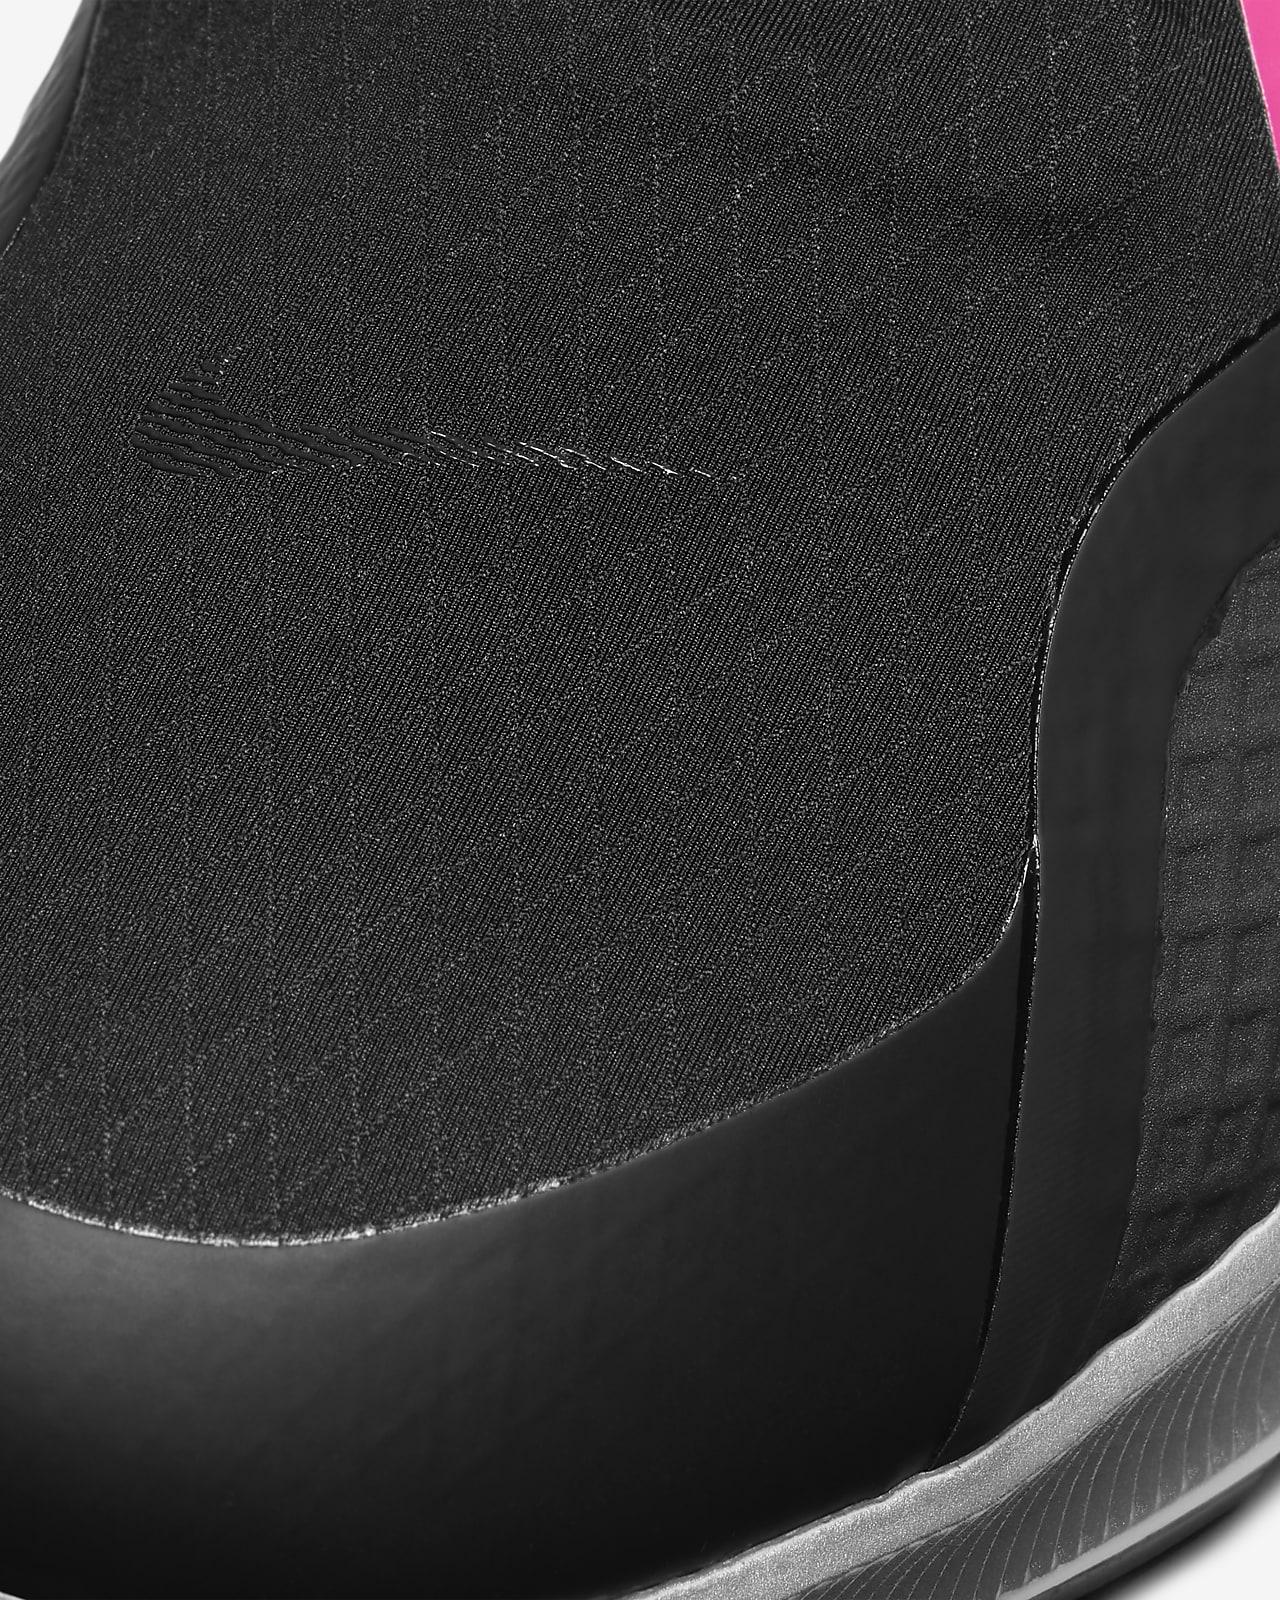 Nike Air Zoom Pegasus 37 Shield Men's Running Shoes